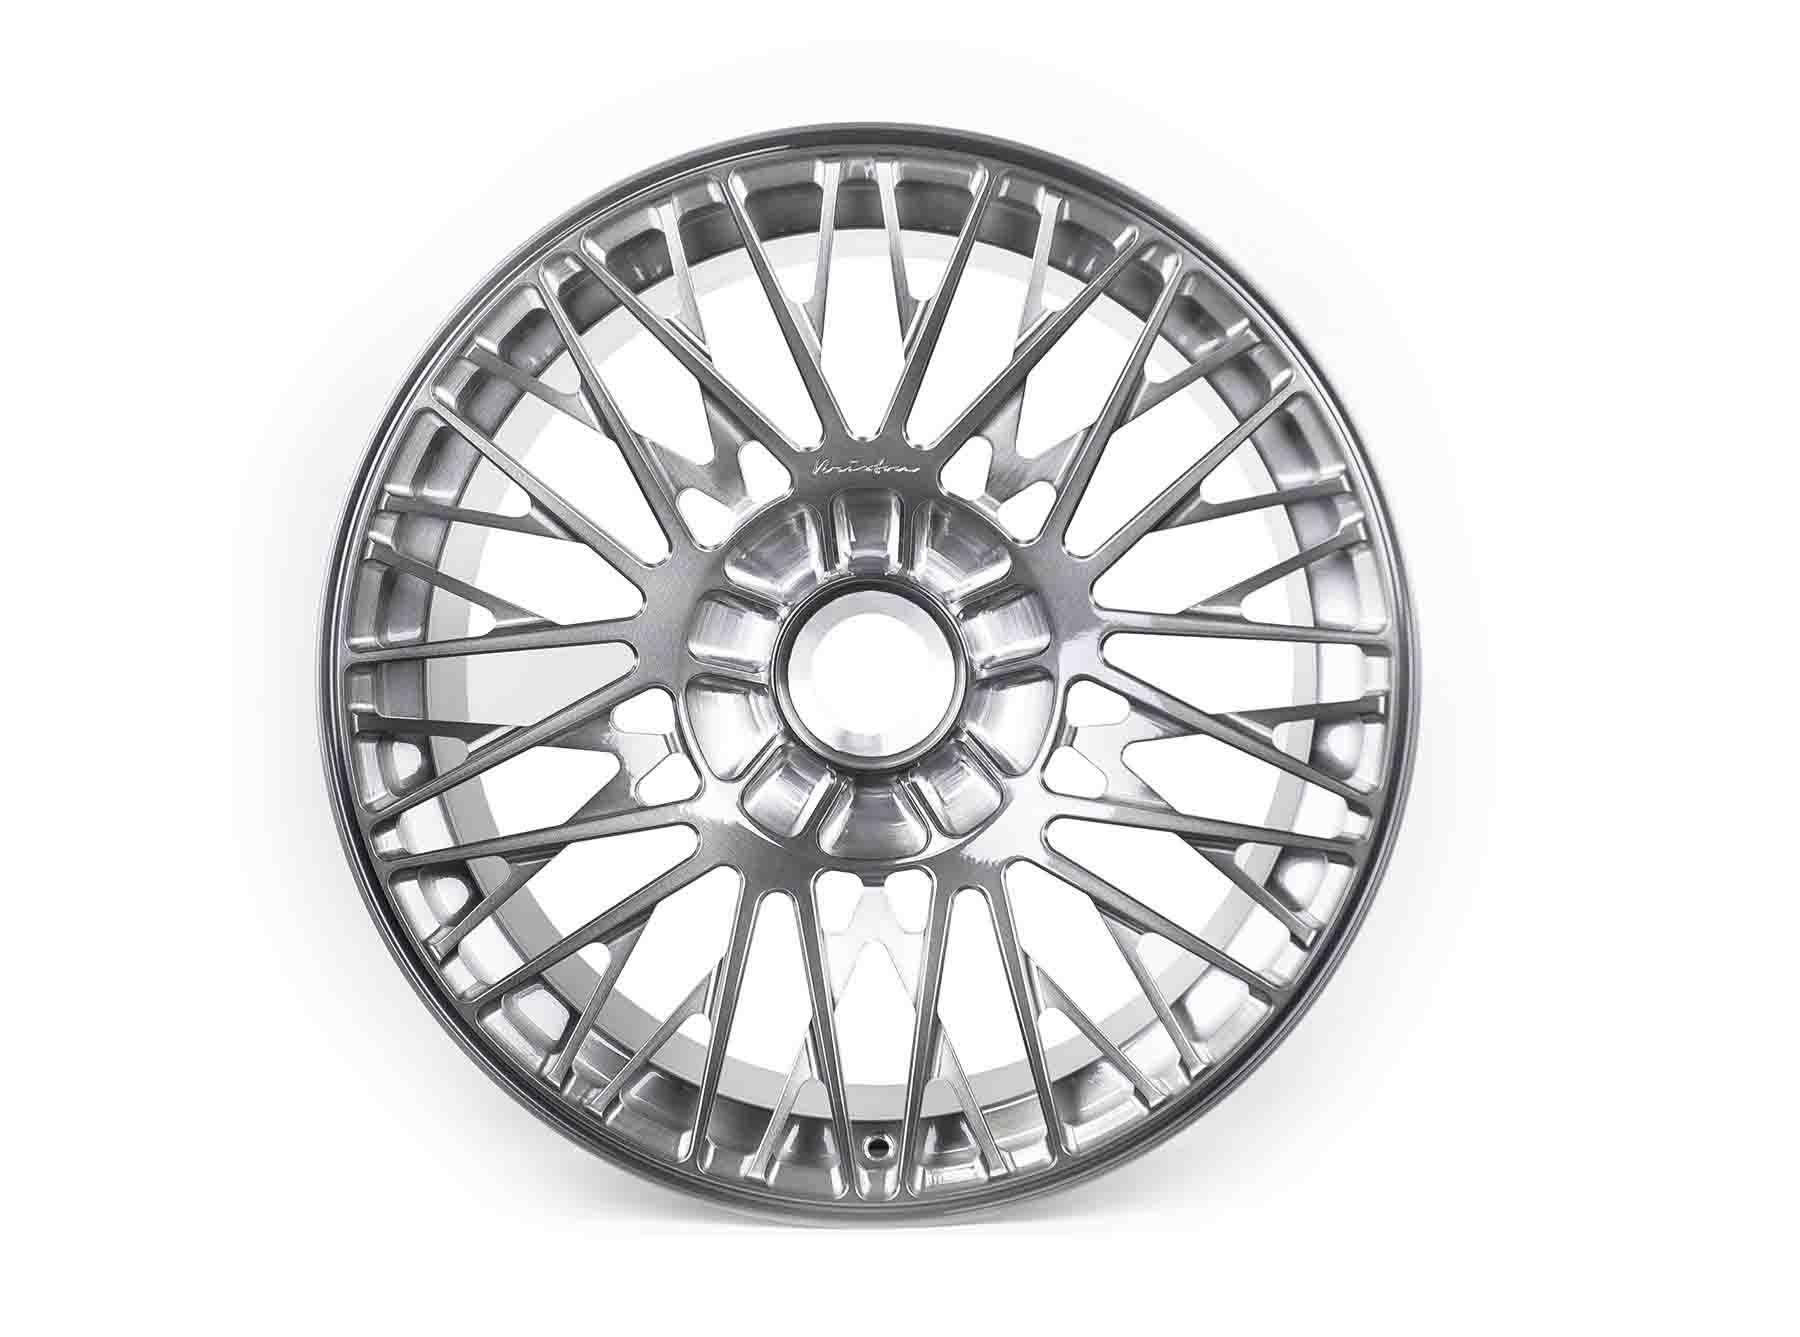 Brixton VL3 (Targa Series)